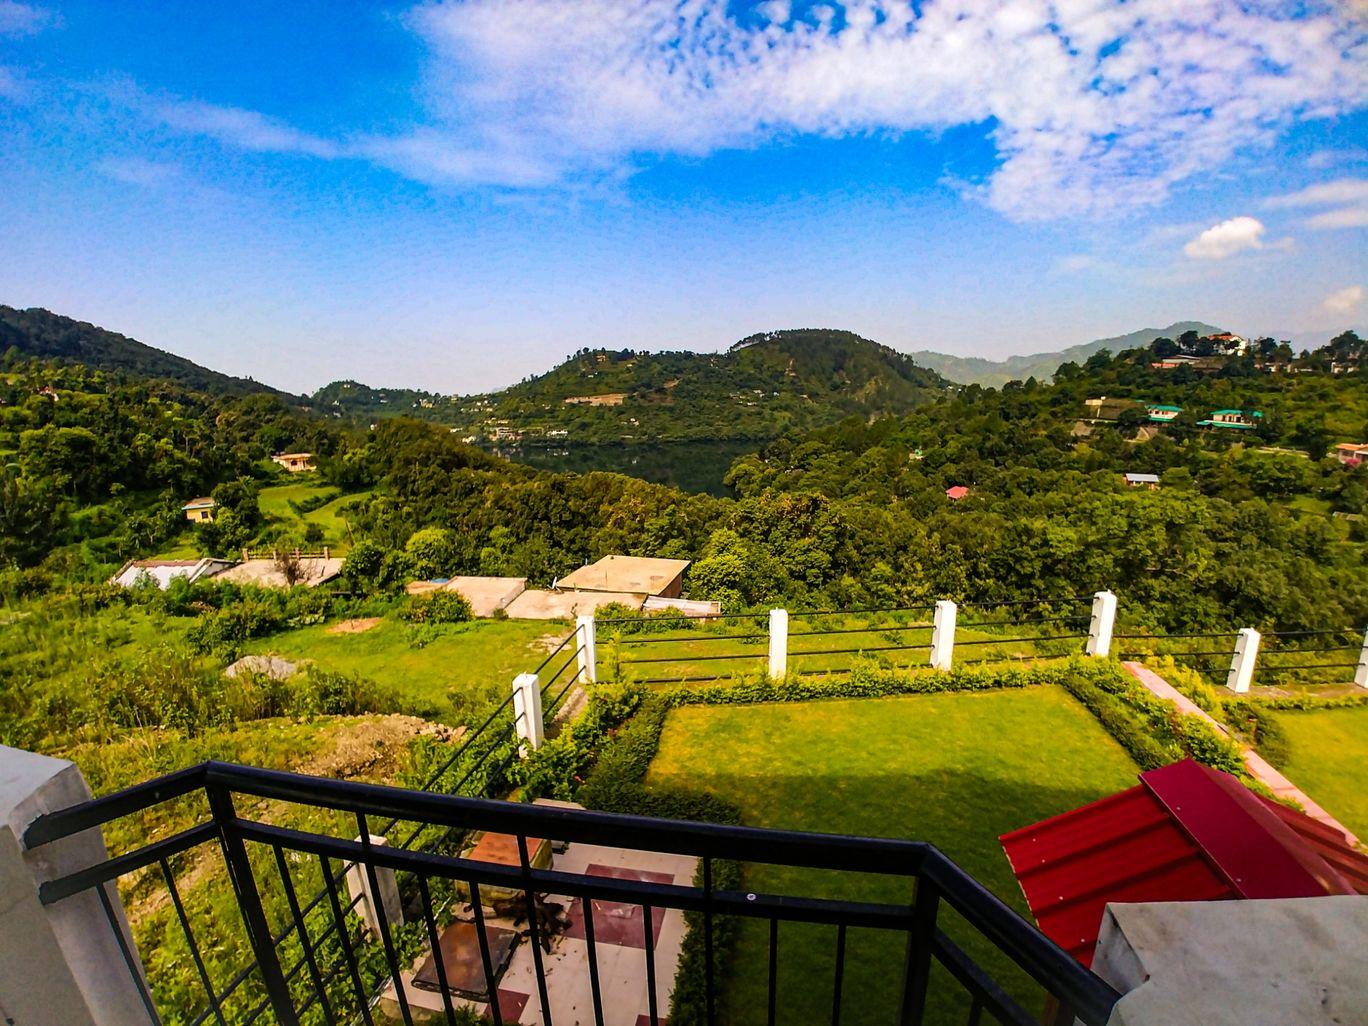 Photo of Nainital By bhawna sain